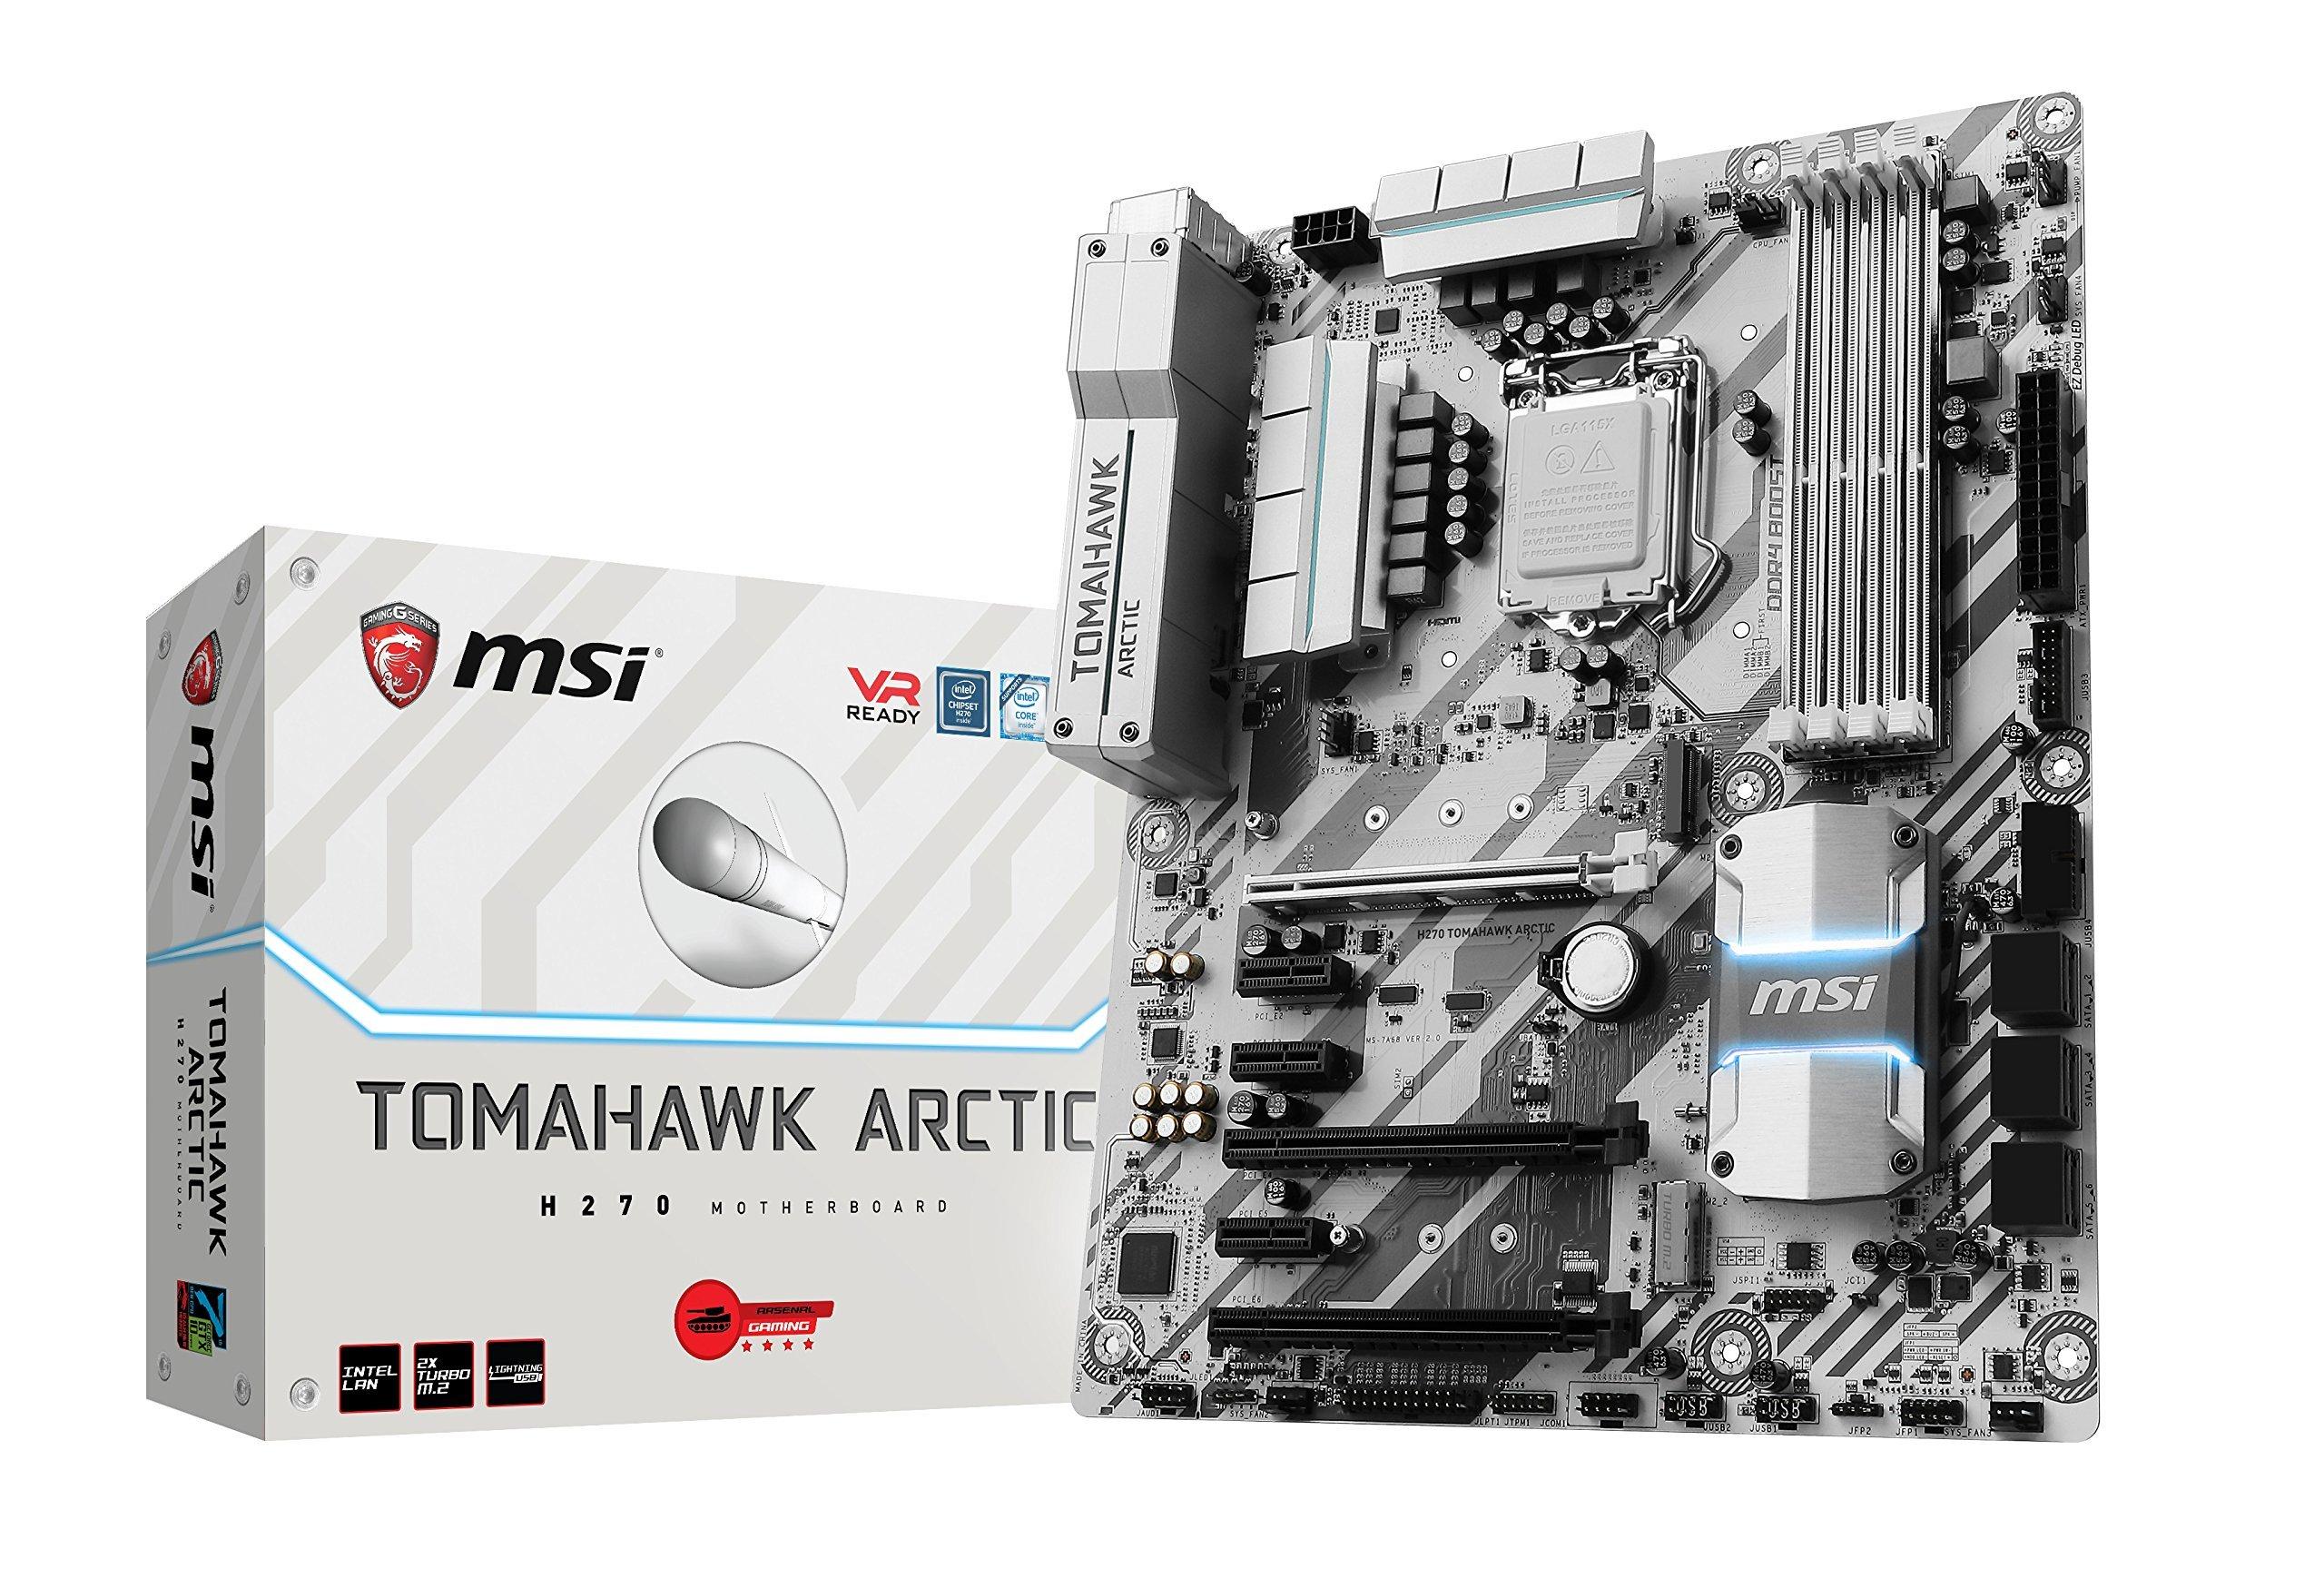 MSI Gaming Intel H270 DDR4 HDMI USB 3 CrossFire ATX Motherboard (H270 TOMAHAWK ARCTIC) (Certified Refurbished)